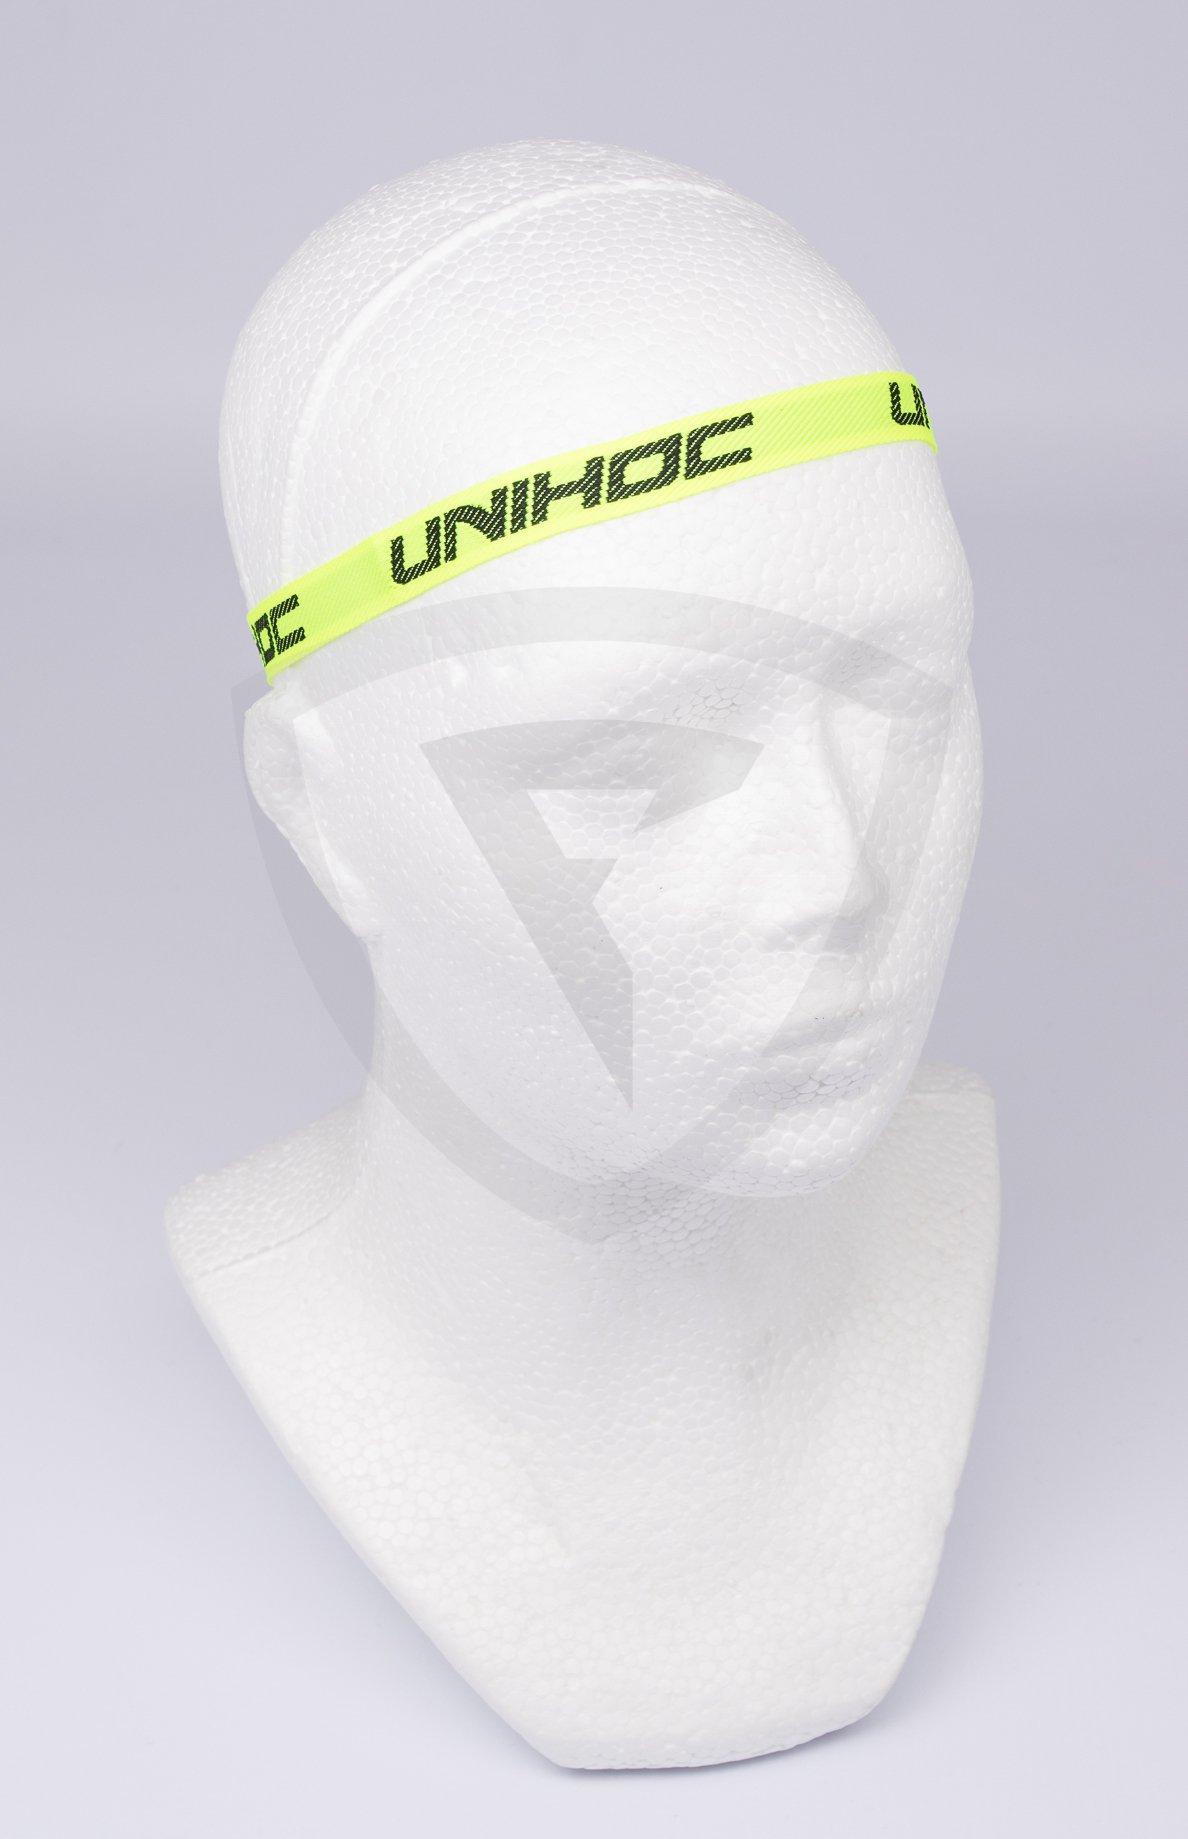 Unihoc Hairband - Florbal.com 2637ef77e5